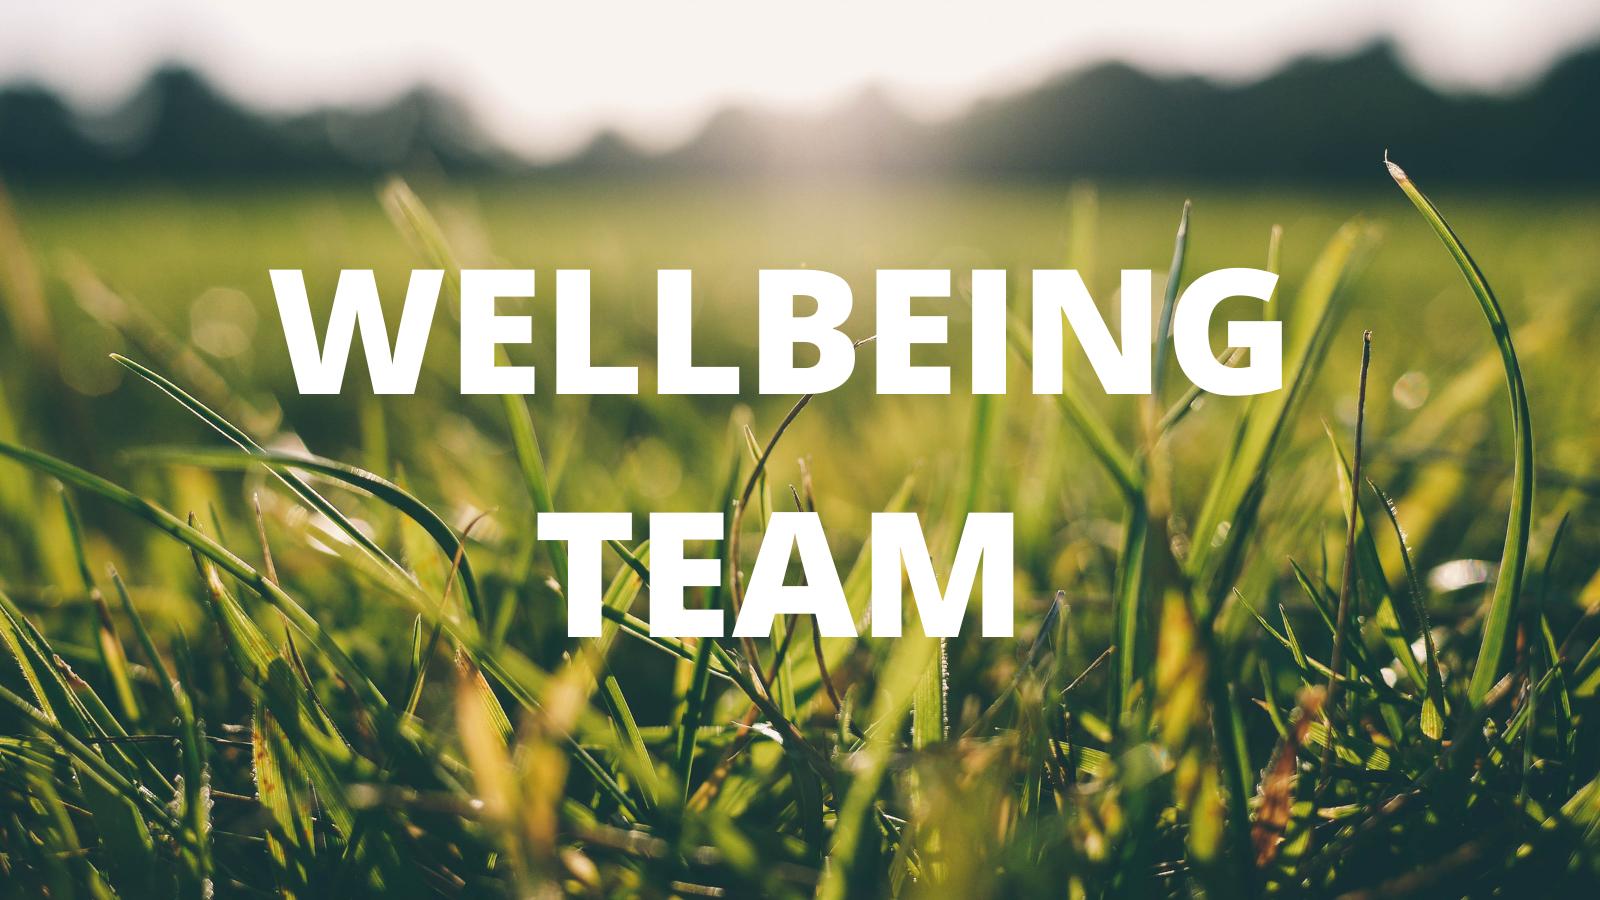 Wellbeing Team